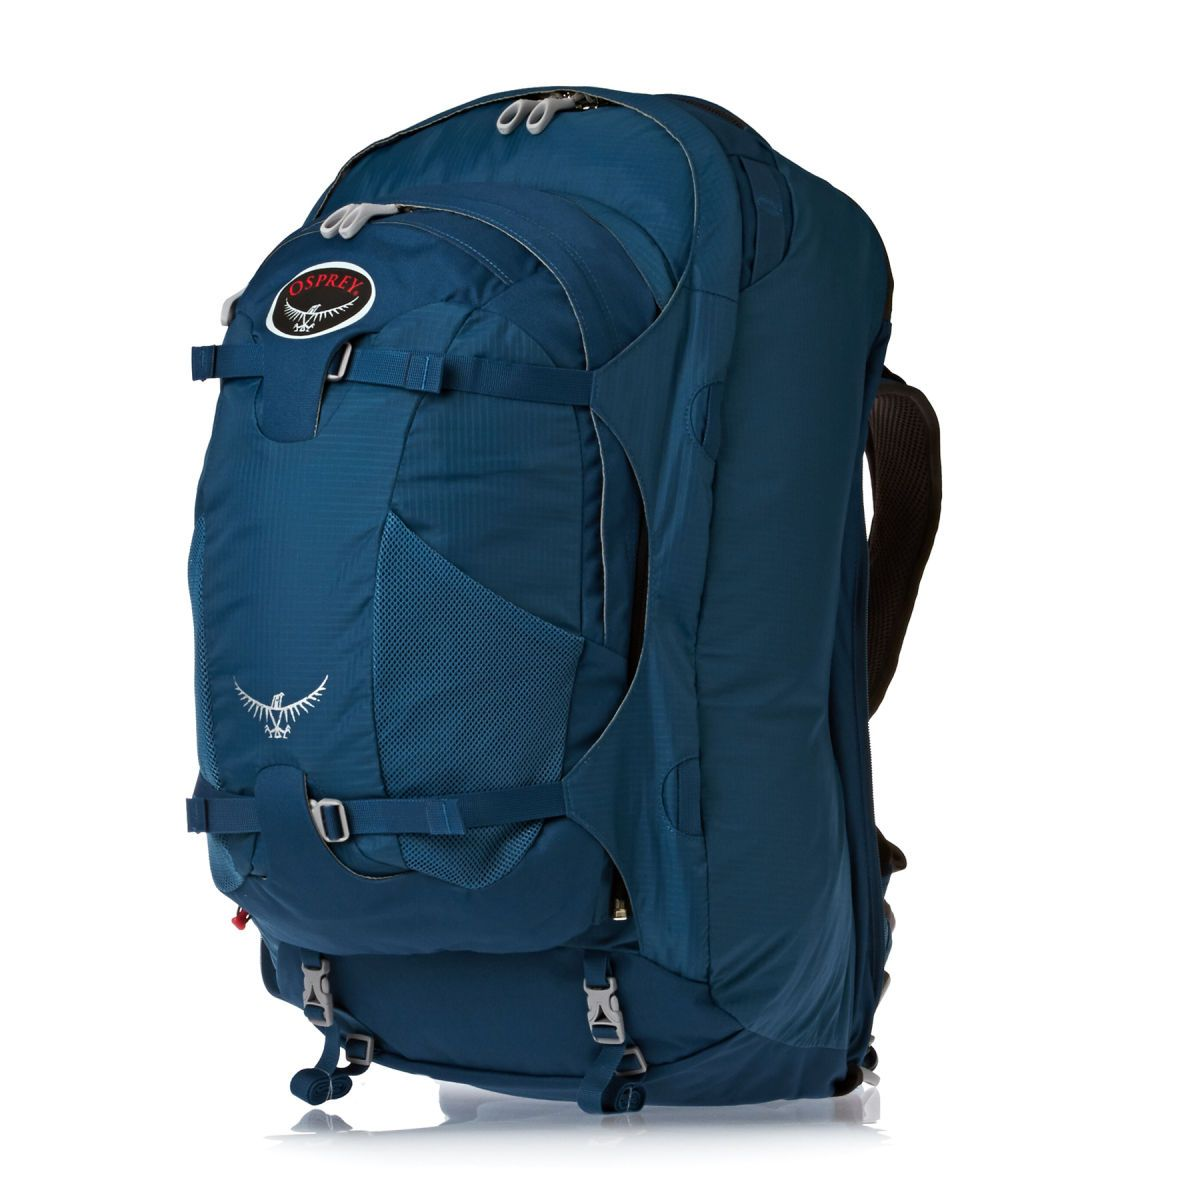 Osprey womens leather gloves - Osprey Backpacks Osprey Farpoint 70 Backpack Lagoon Blue